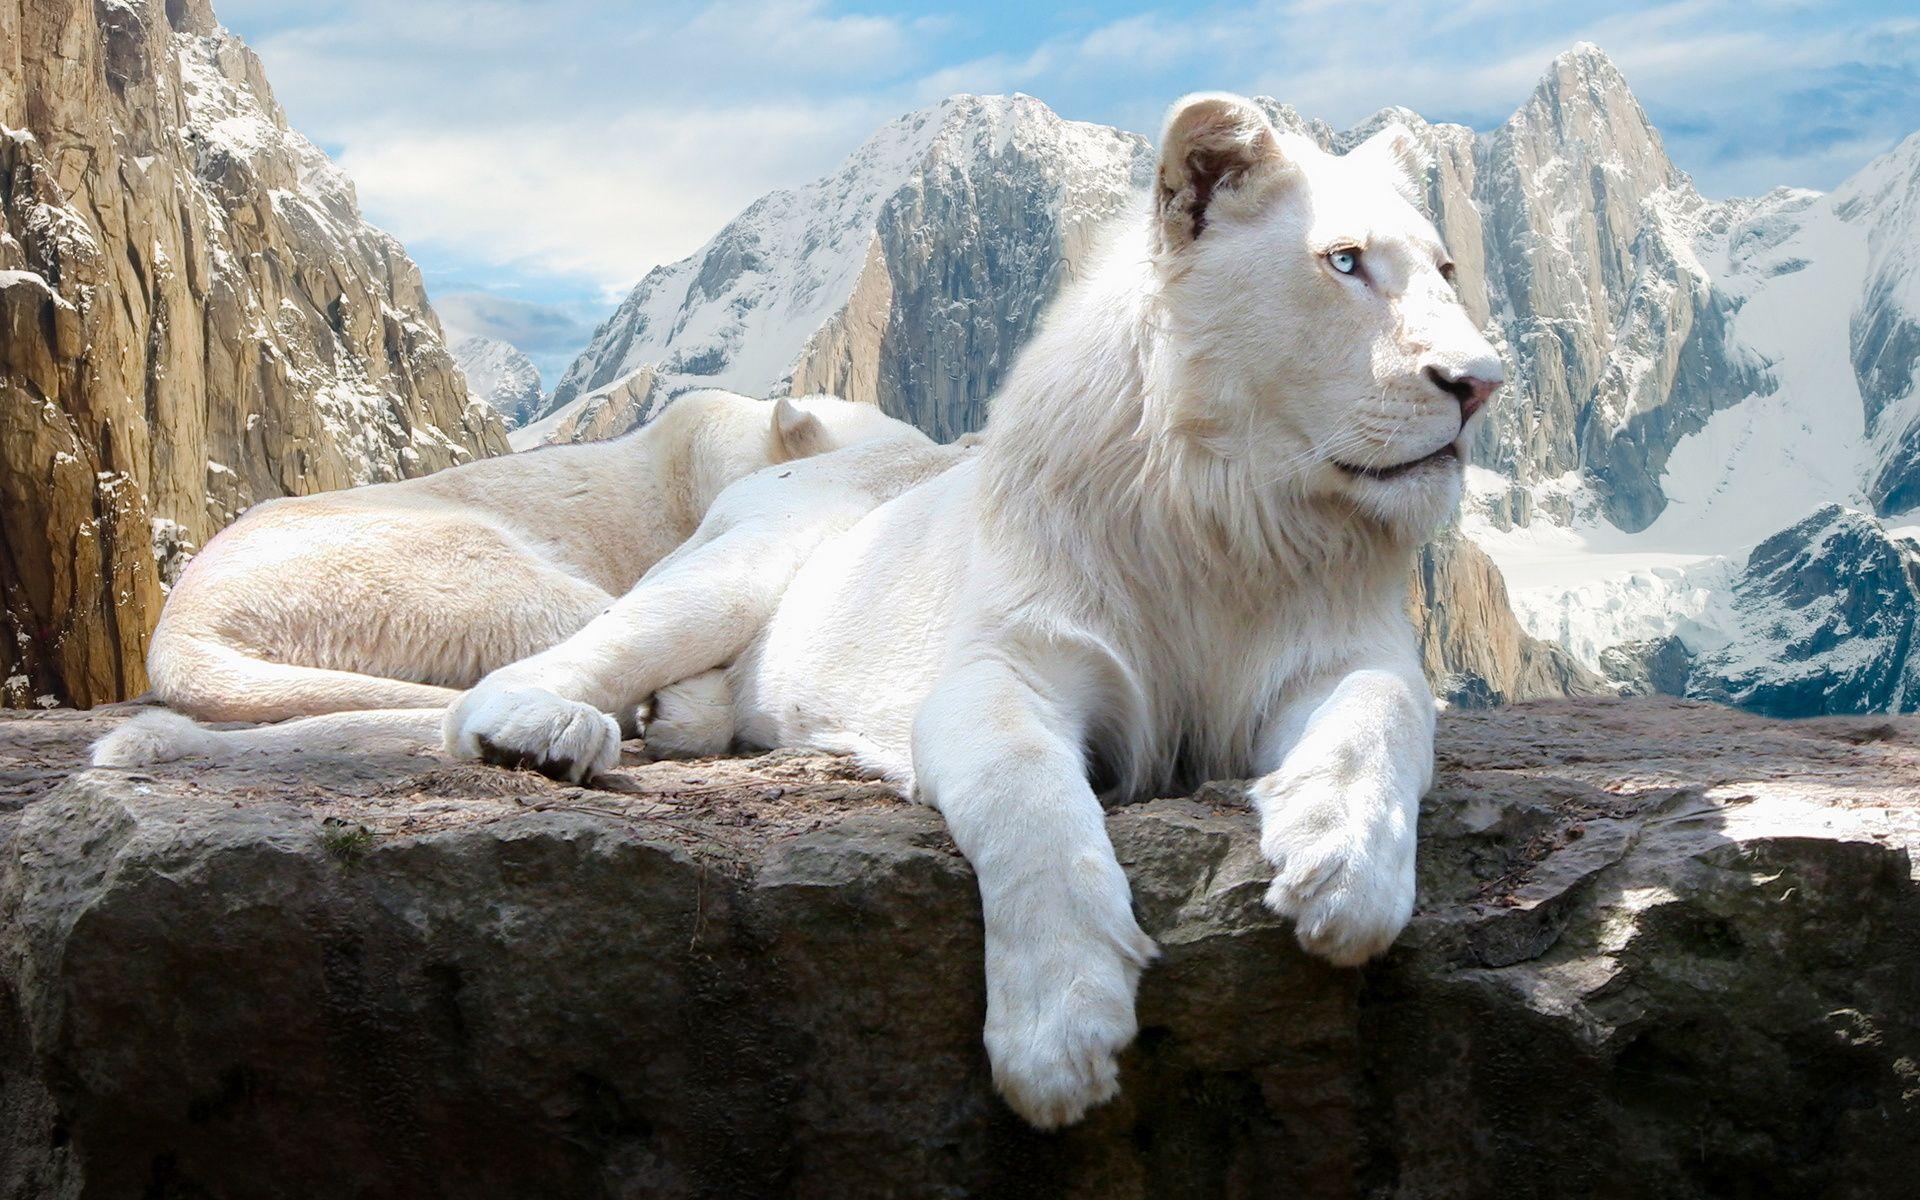 Lion Hd Wallpaper Albino Lion White Lion Animals Beautiful